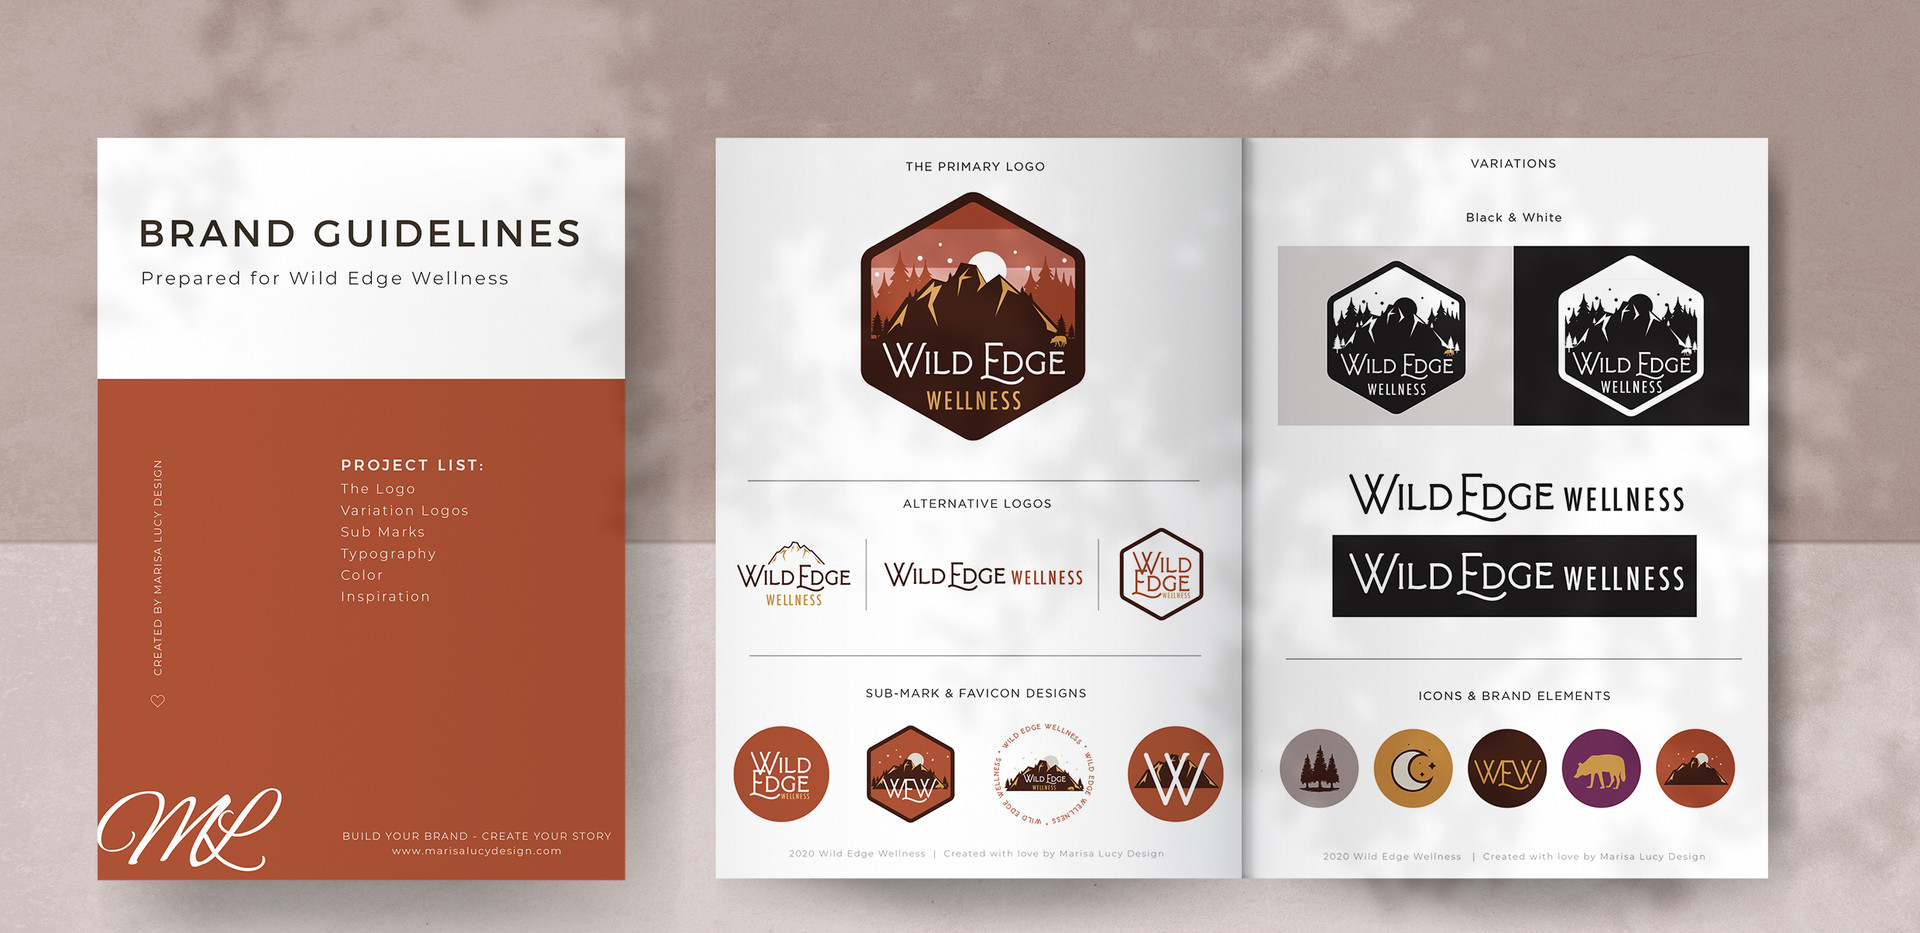 Wild Edge Wellness Brand